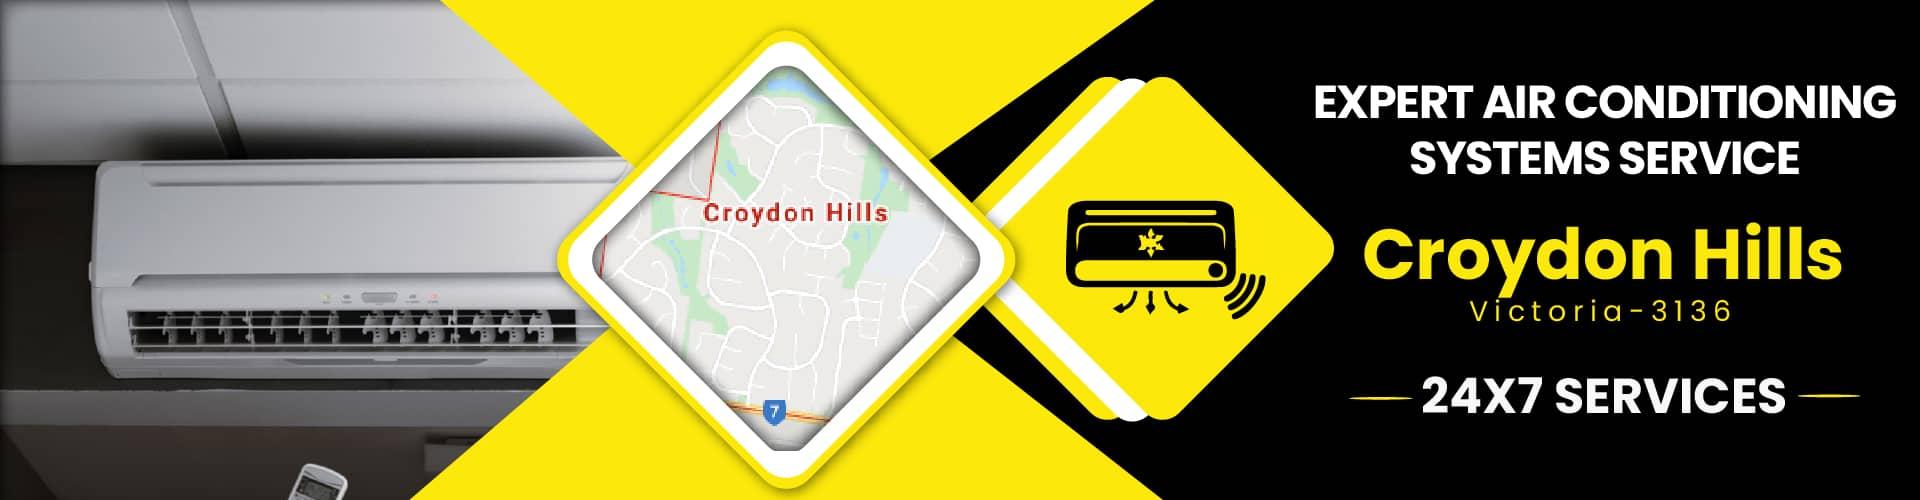 Air Conditioning Croydon Hills